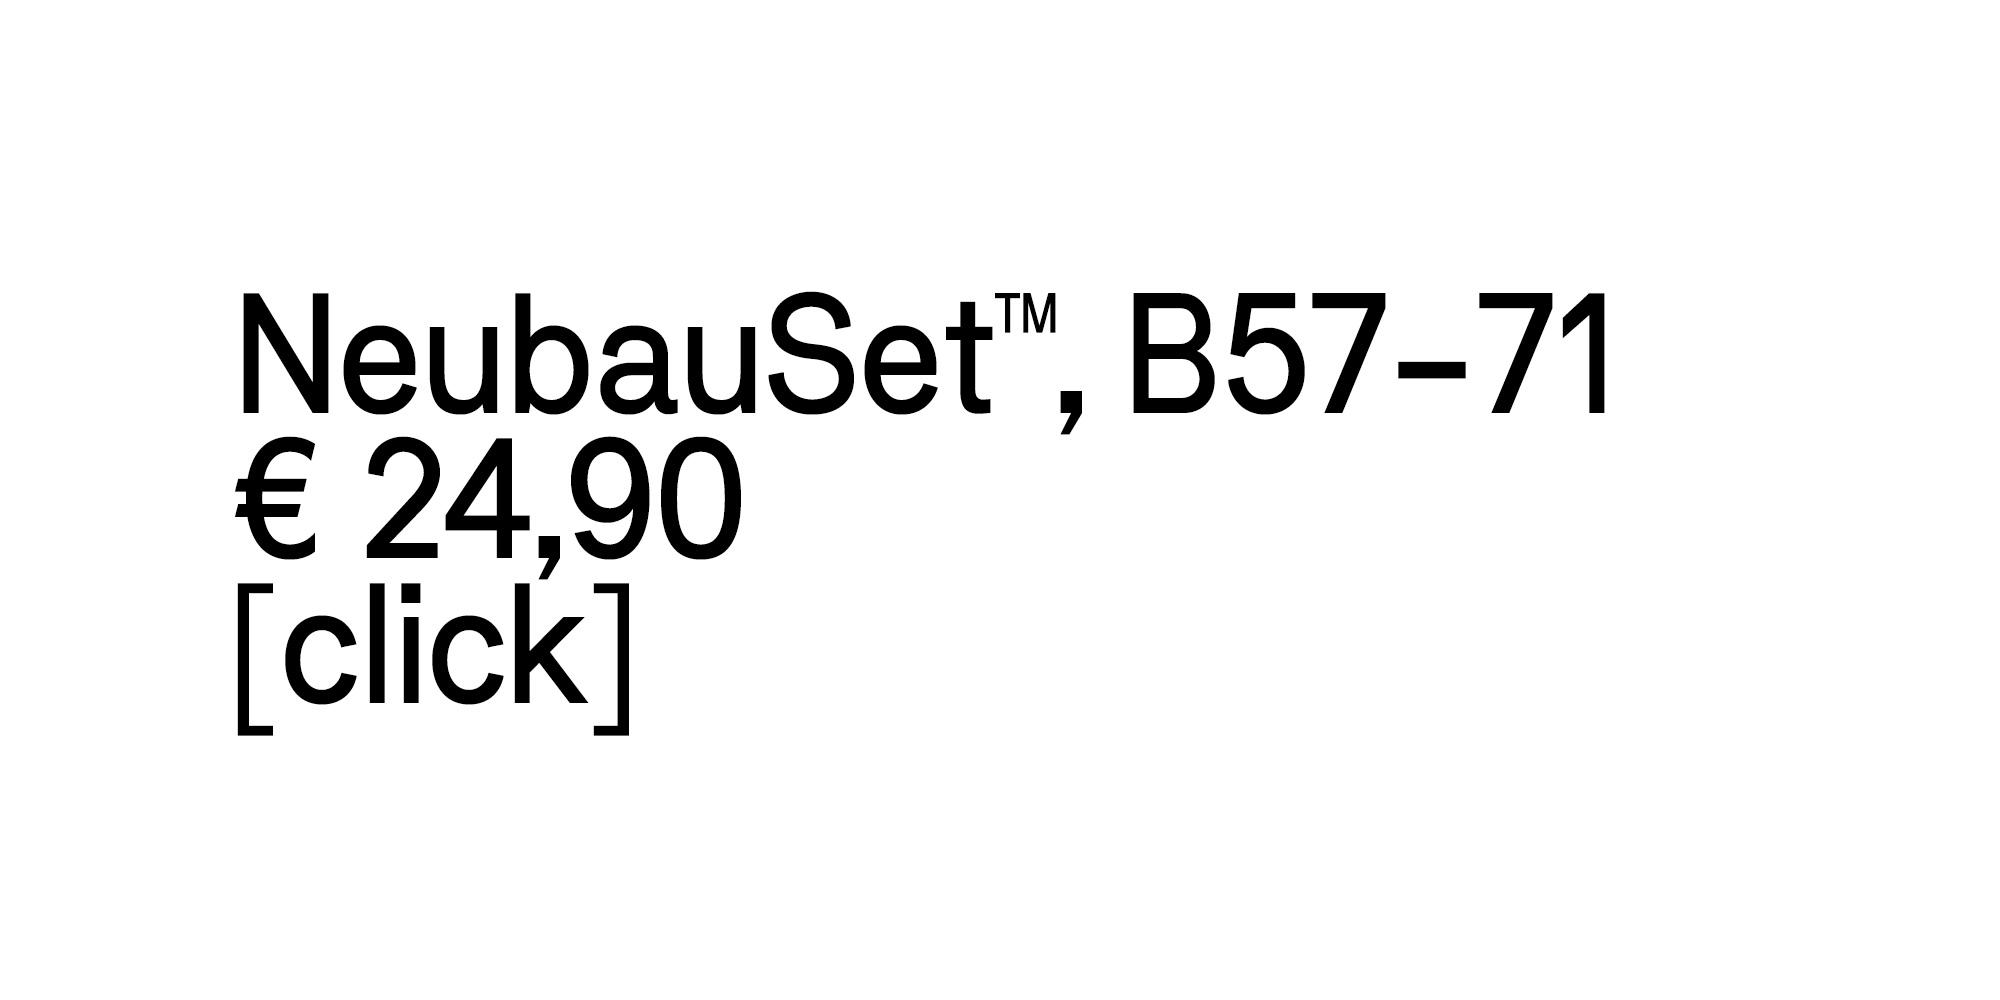 NBL-NeubauSetB57-71